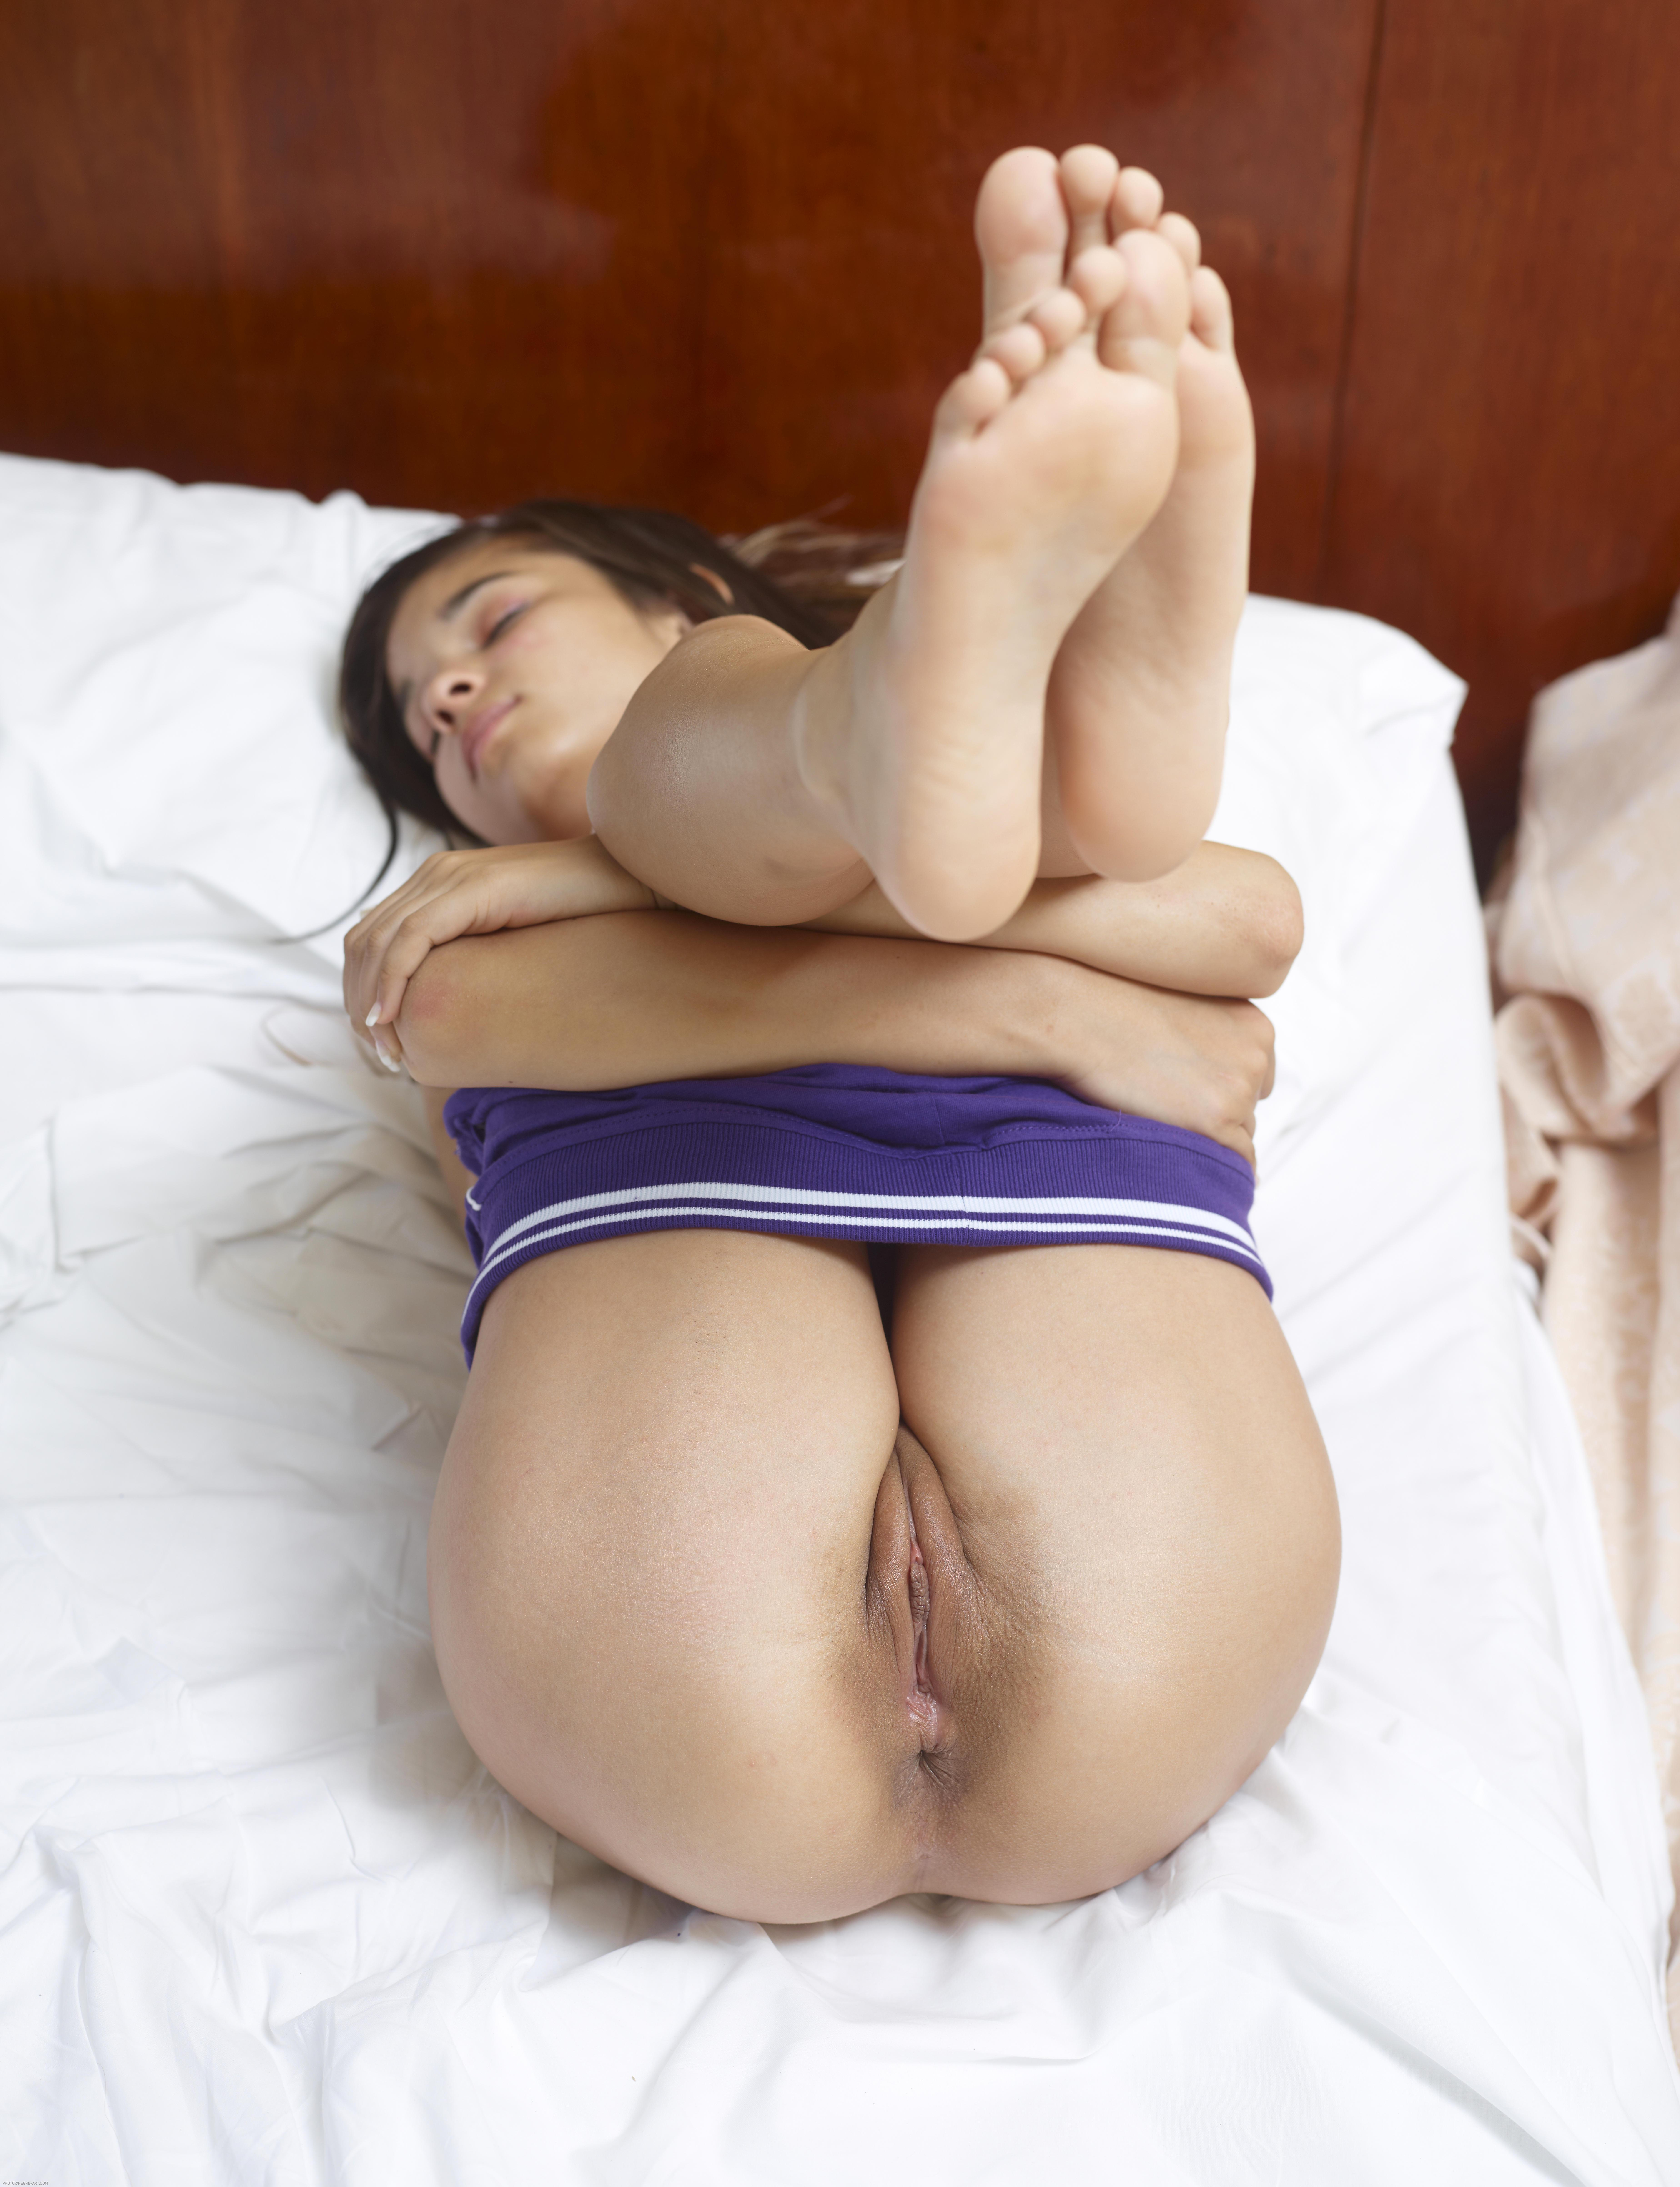 Sex In Hotpants